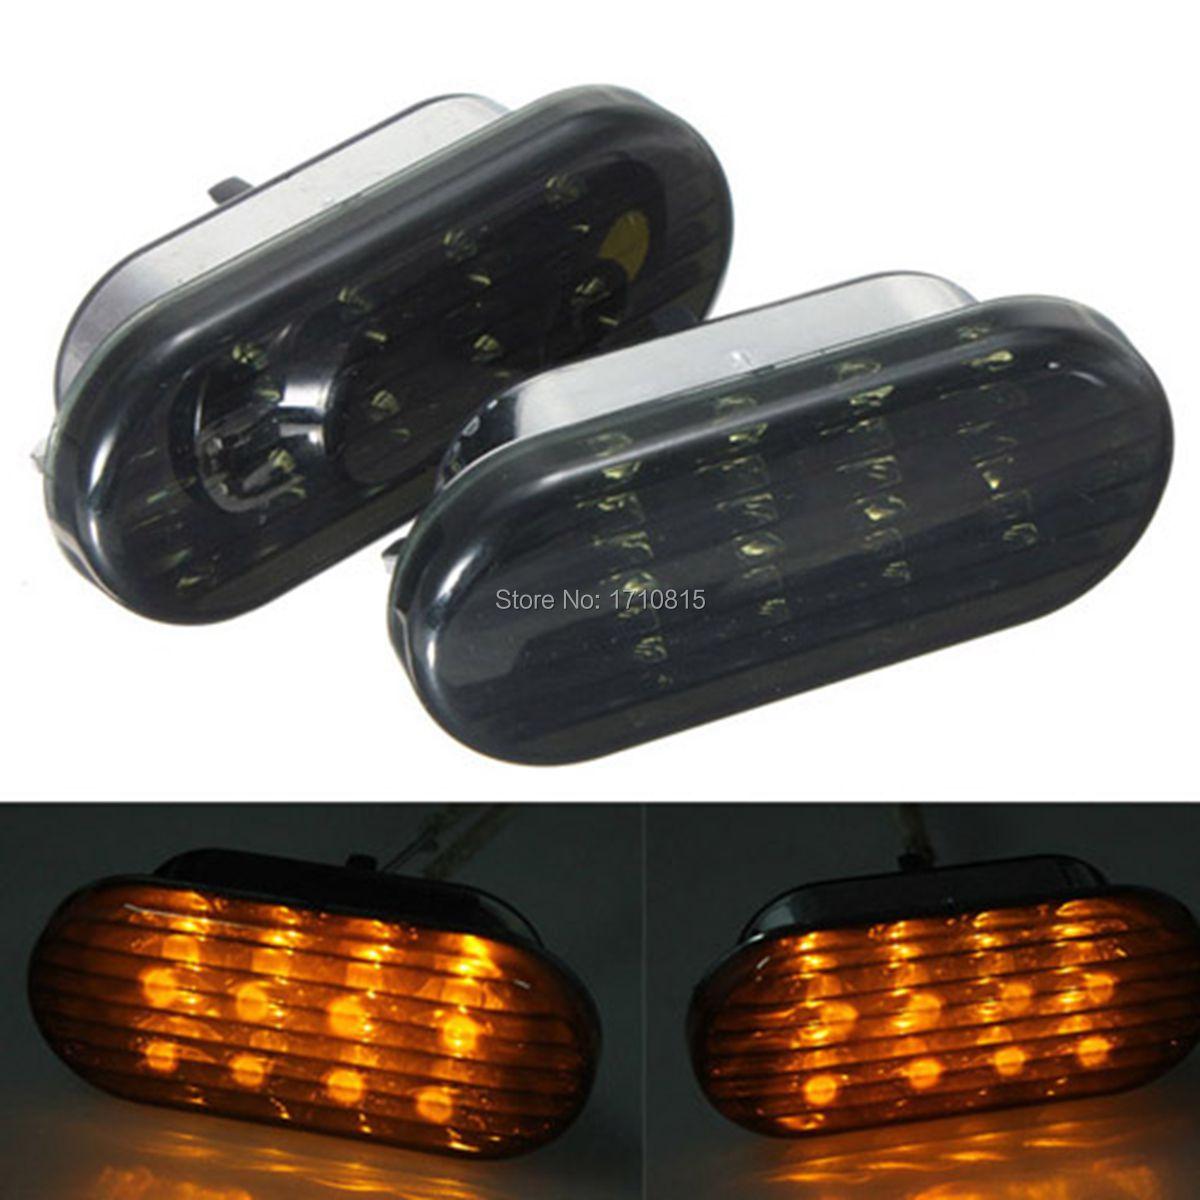 8 LED Amber Smoke Blue Turn Signal Side Marker Light For VW Golf Jetta Passat GTI R32 Beetle 1998-2004(China (Mainland))